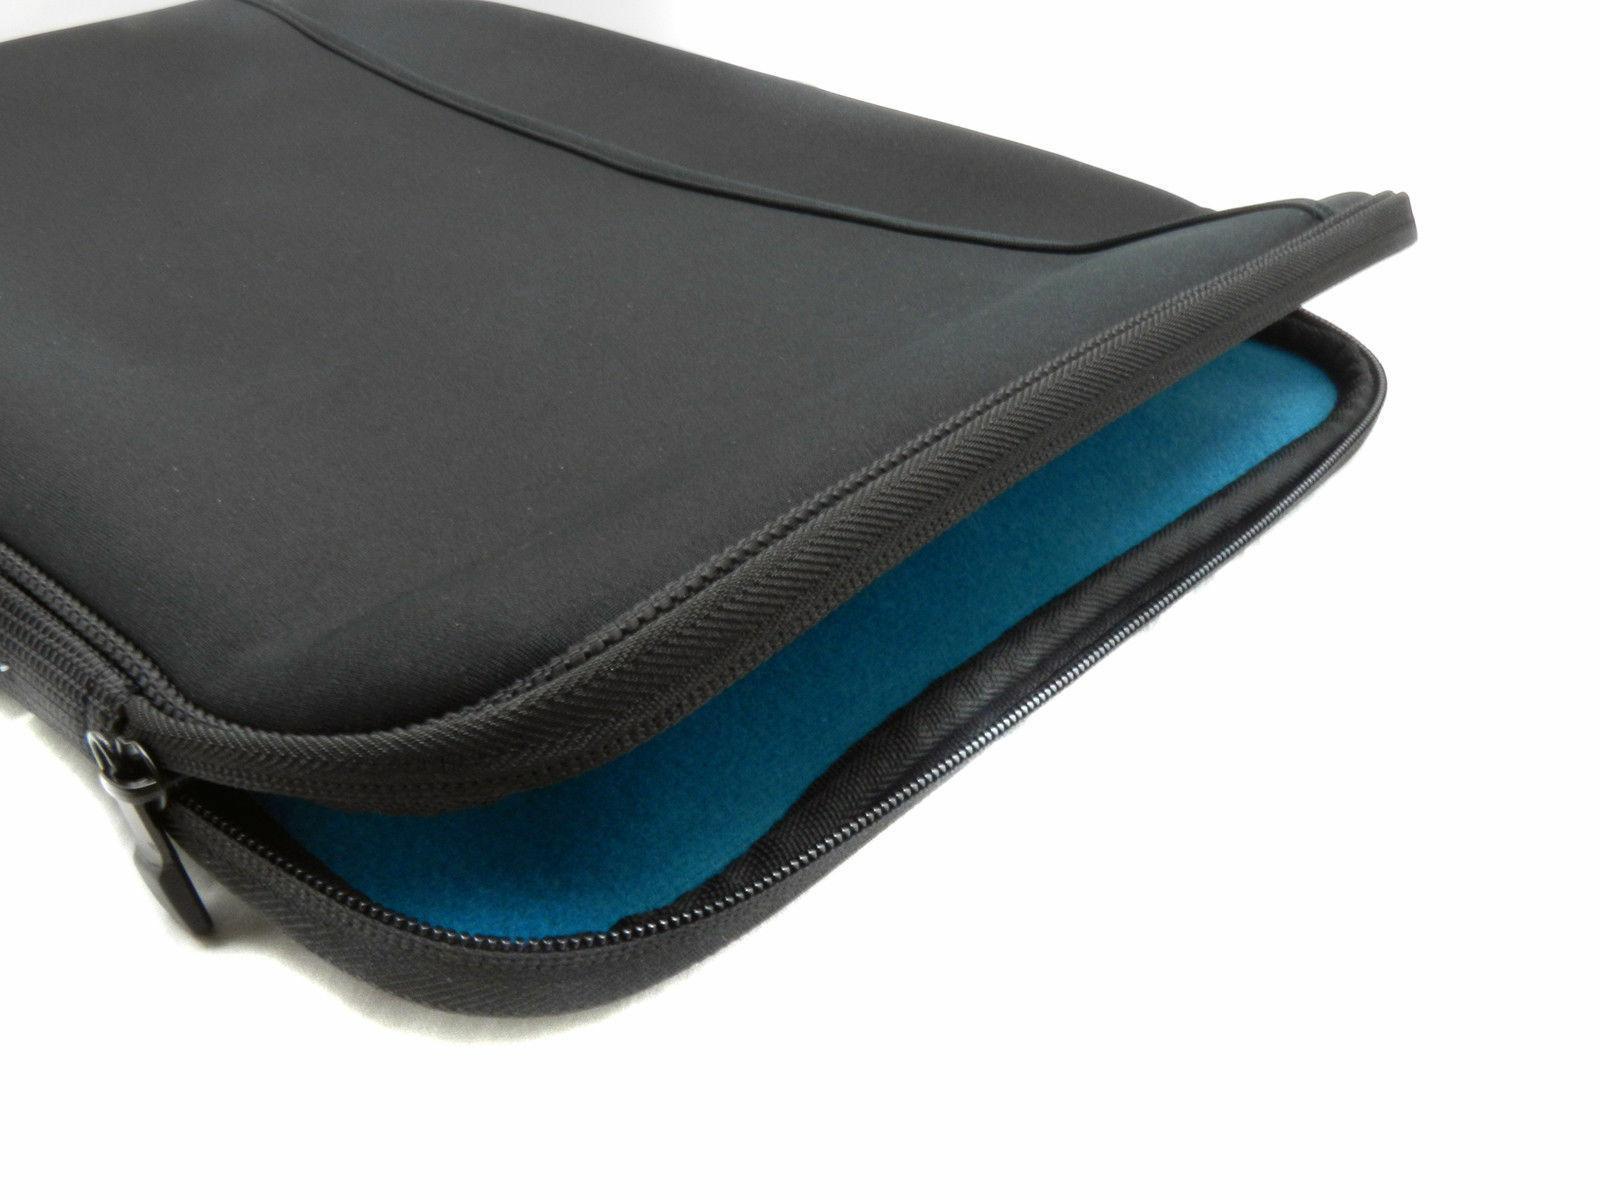 "Logitech Black Notebook Case Cover For 15-15.6"""